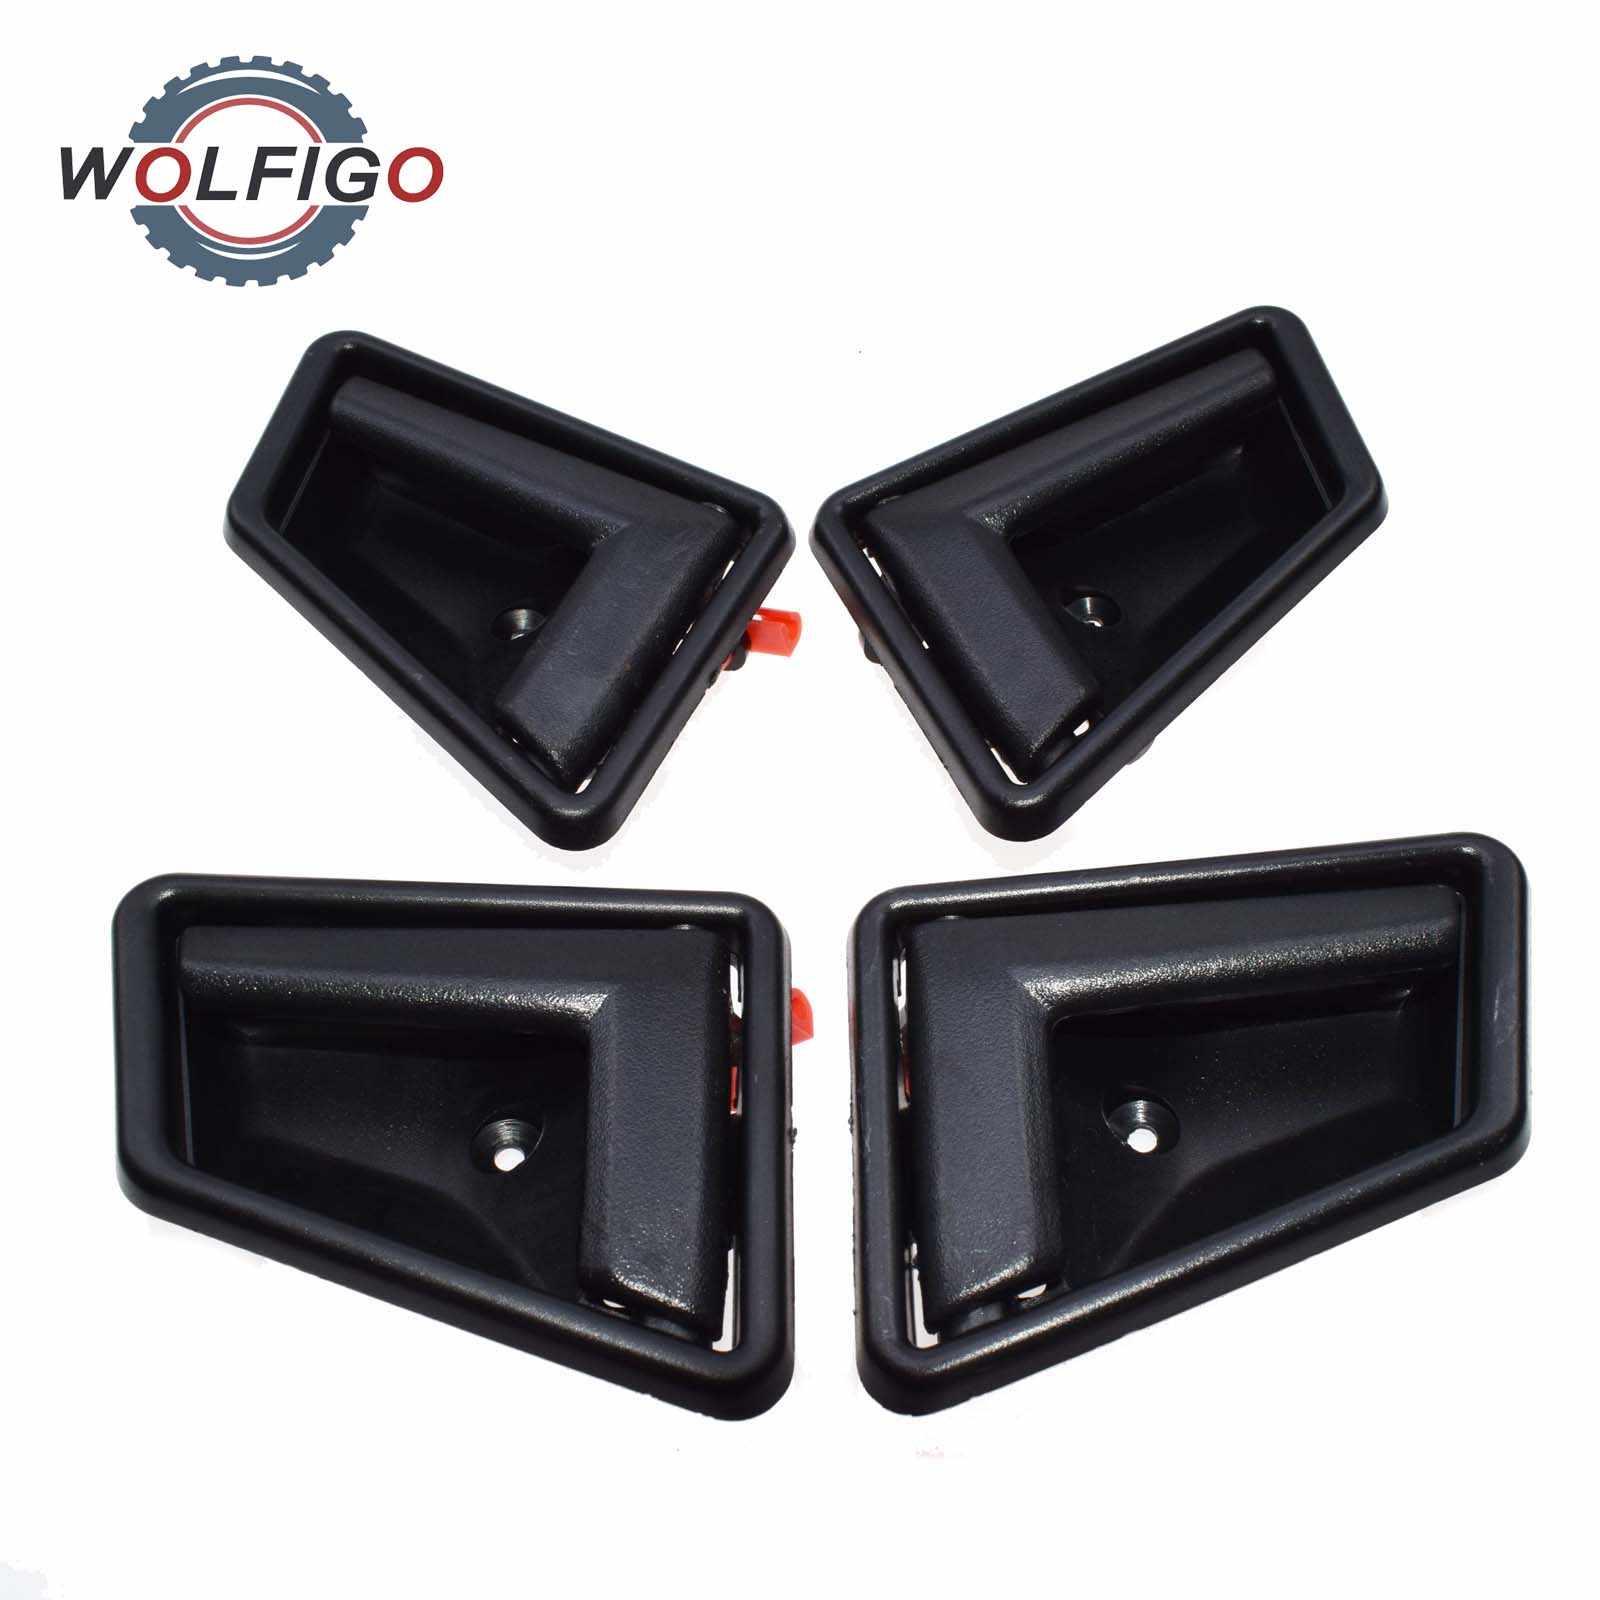 WOLFIGO 車インテリアインナードアハンドル交換シボレー Geo トラッカー鈴木サイドキック Vitara 1989-1998 8313056B015ES 83110-56B01